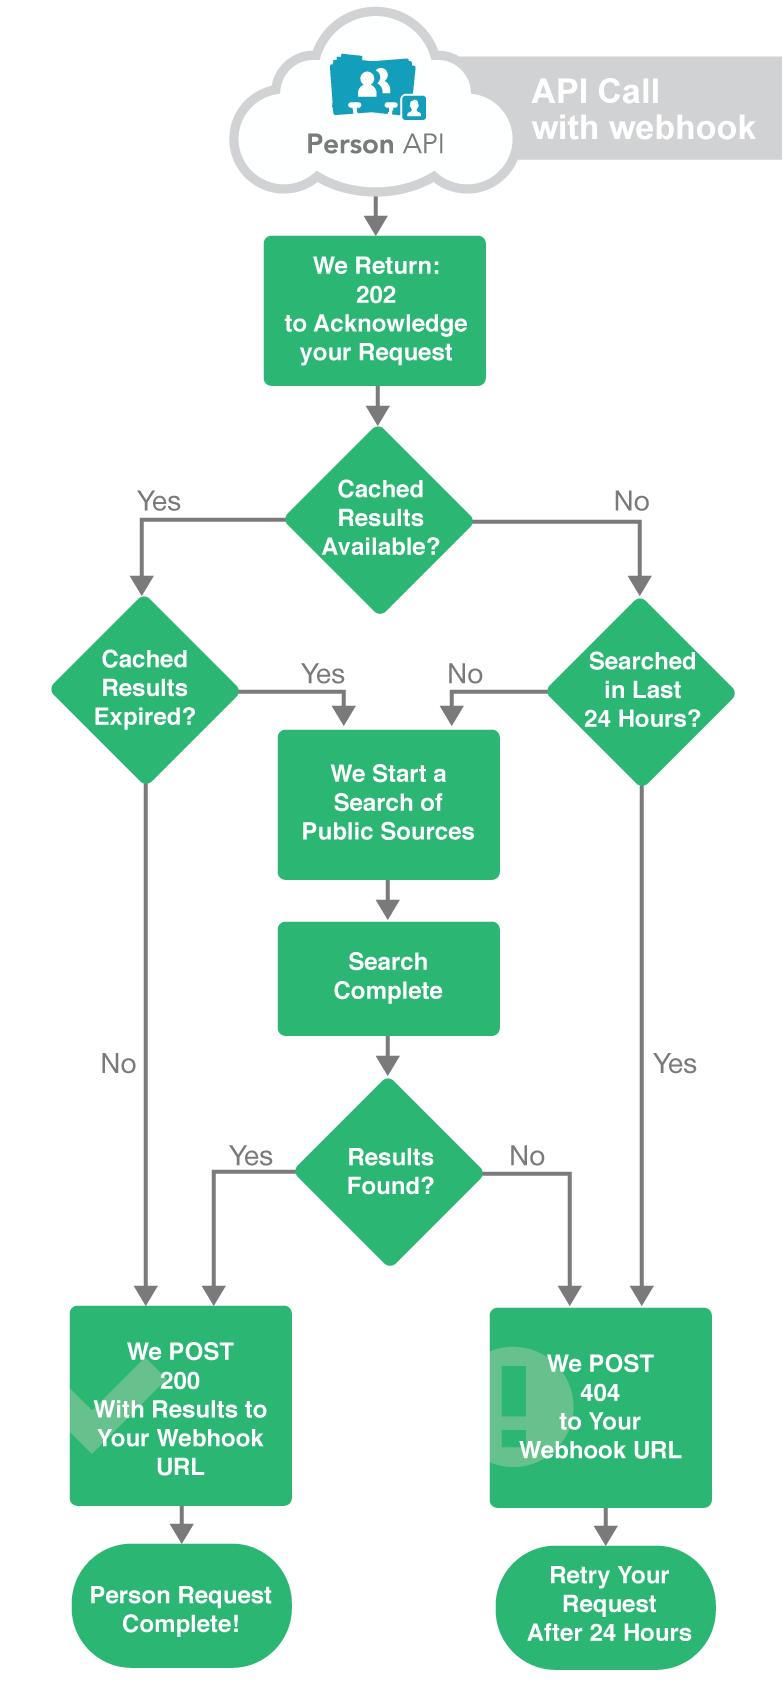 FullContact Person API Webhooks Flow Diagram